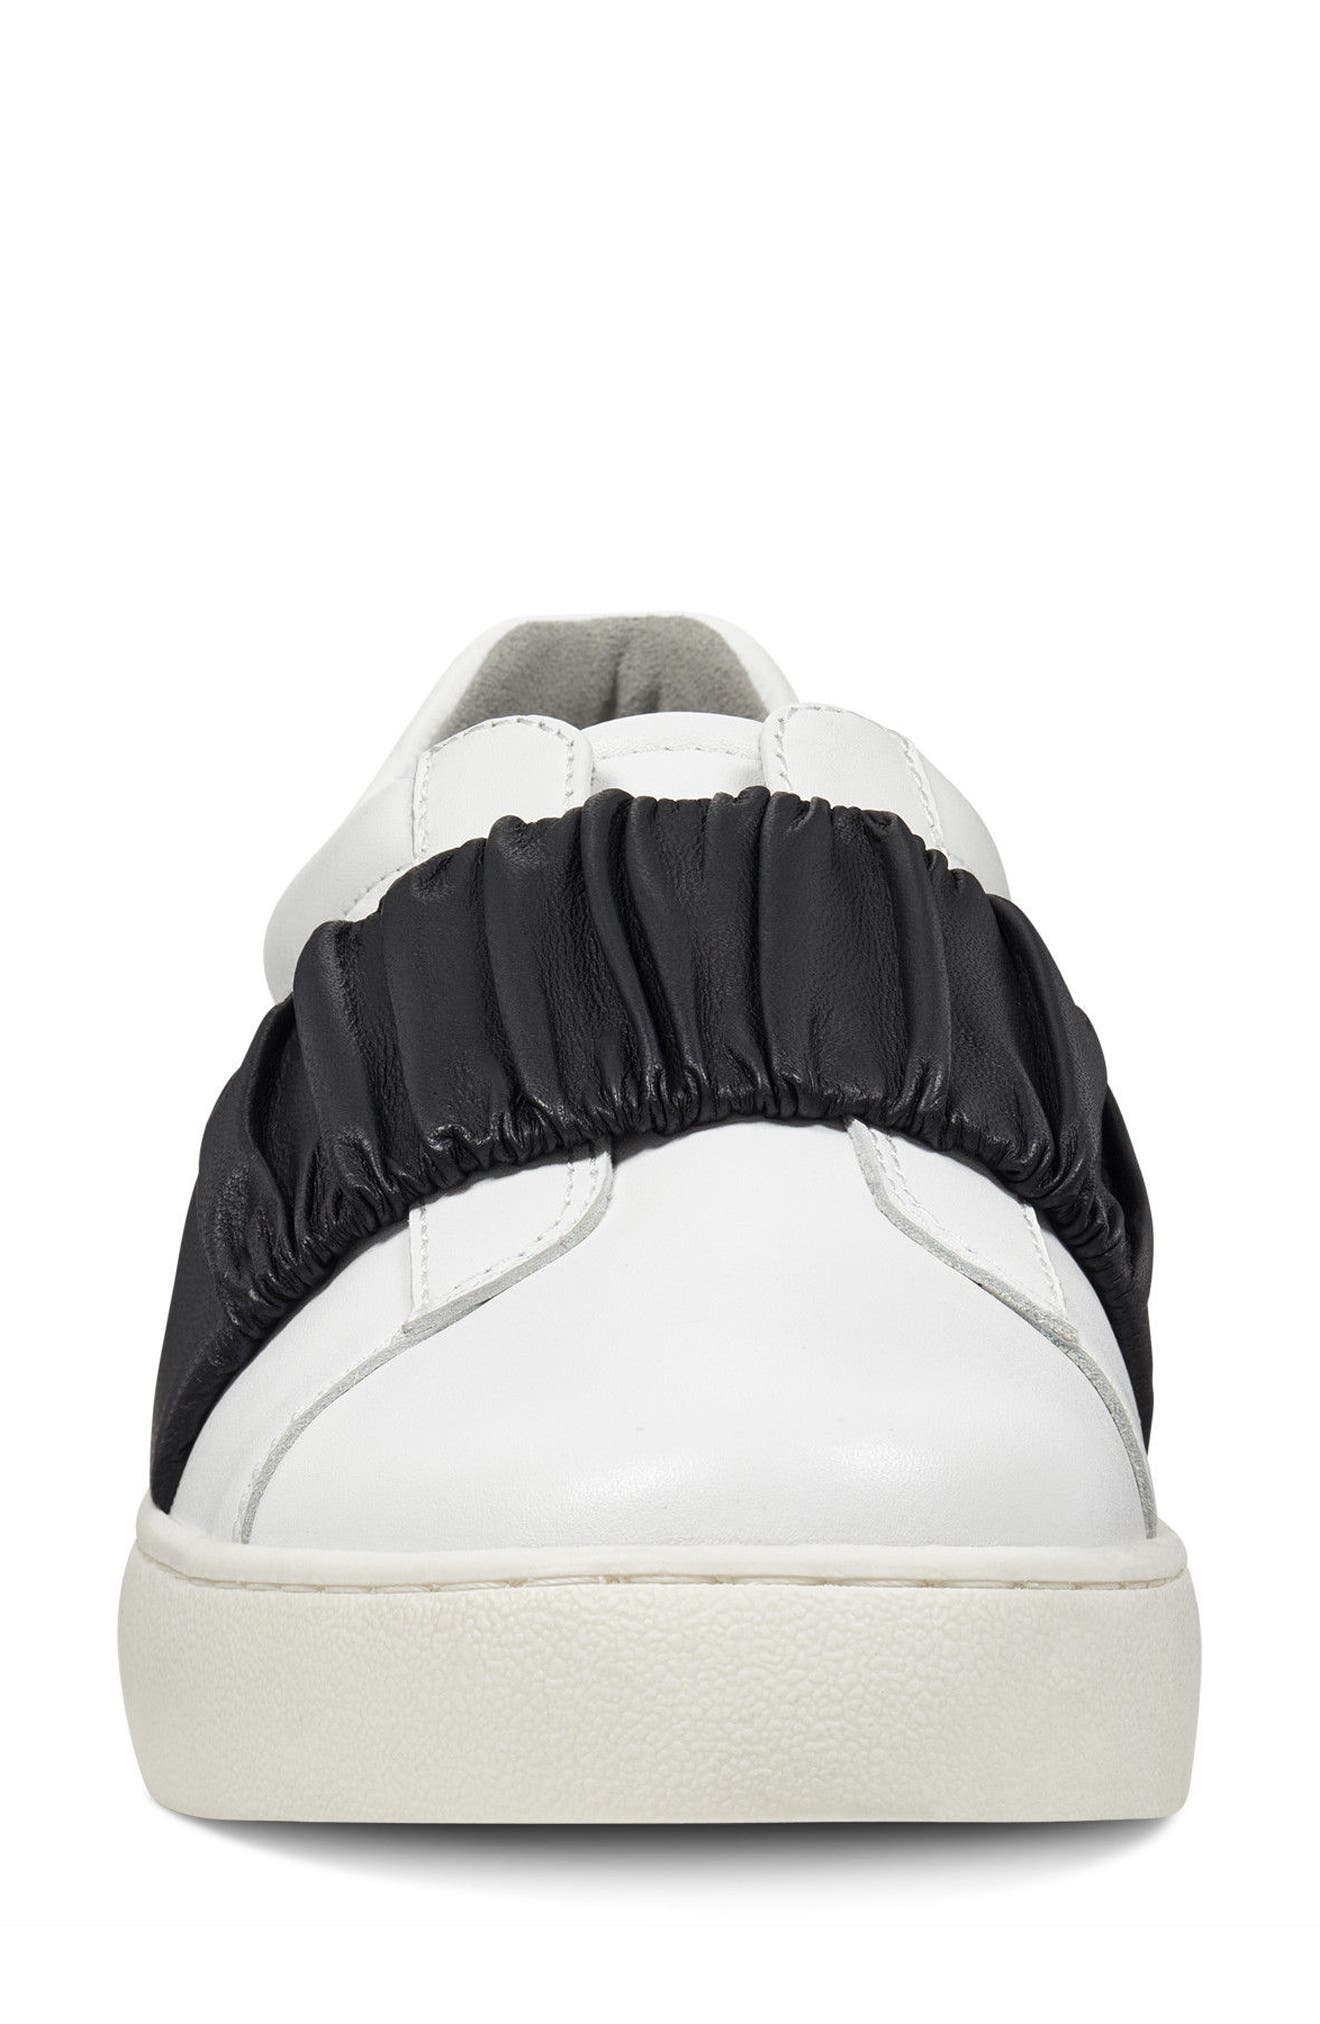 Pindiviah Slip-On Sneaker,                             Alternate thumbnail 4, color,                             White/ Black Leather